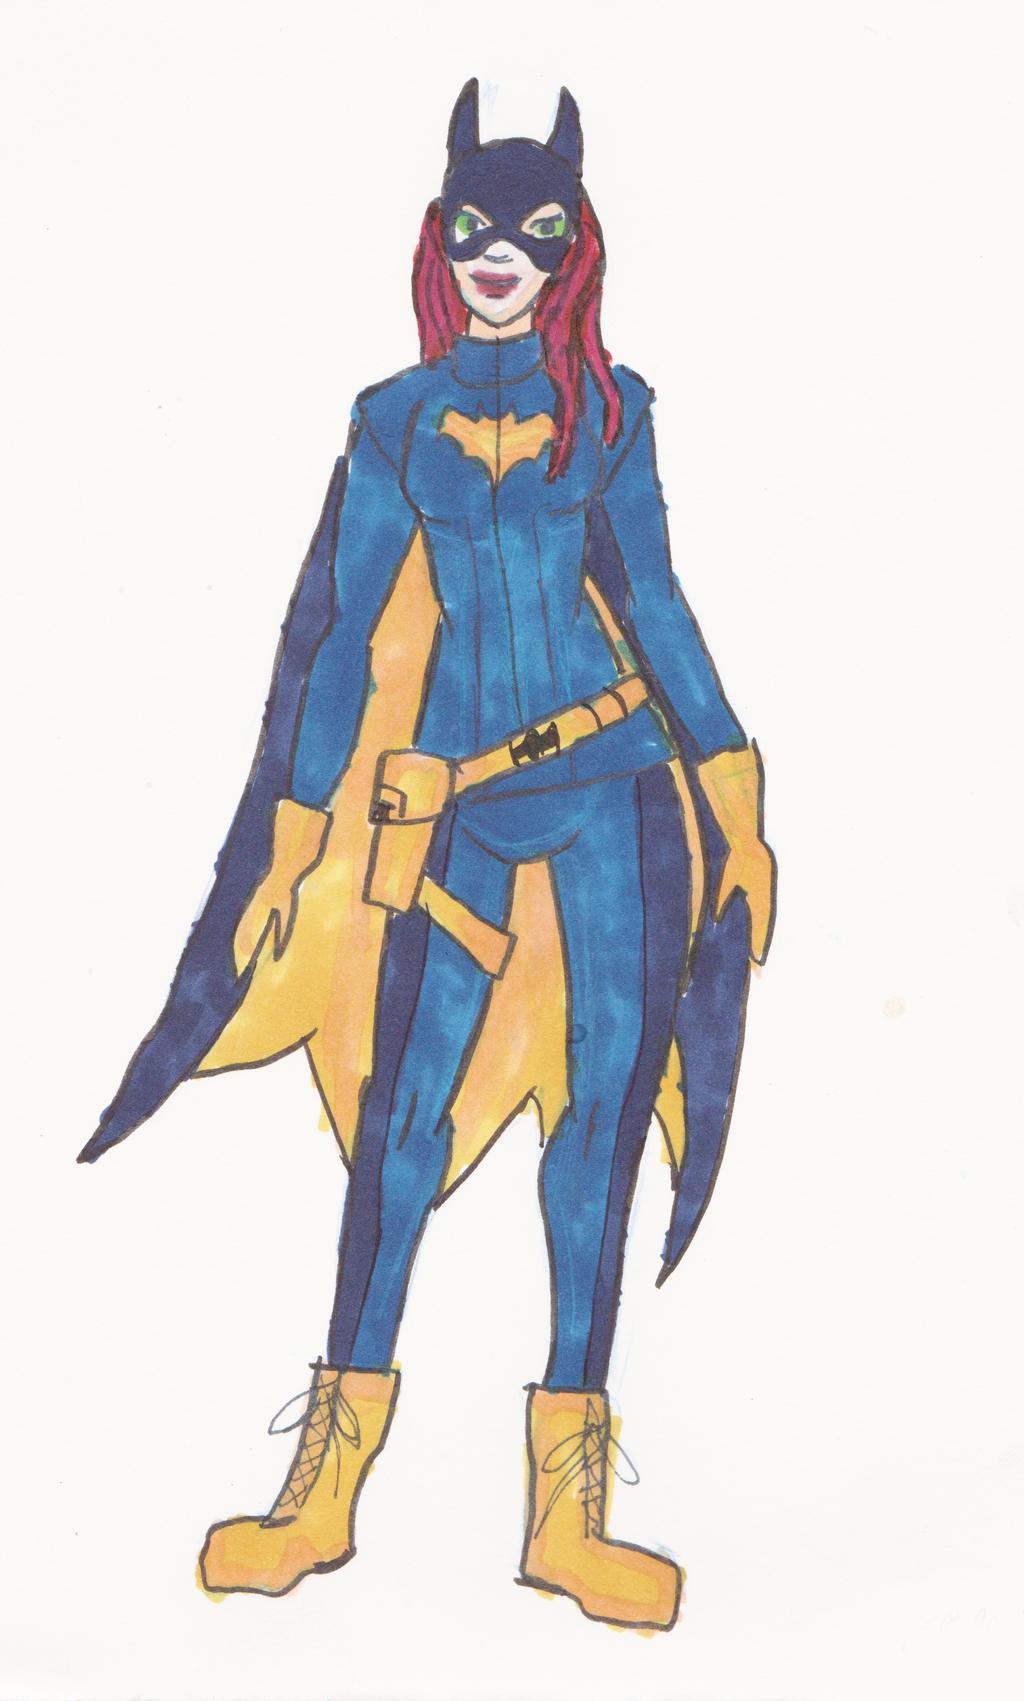 batgirl new 52 wallpaper - photo #32